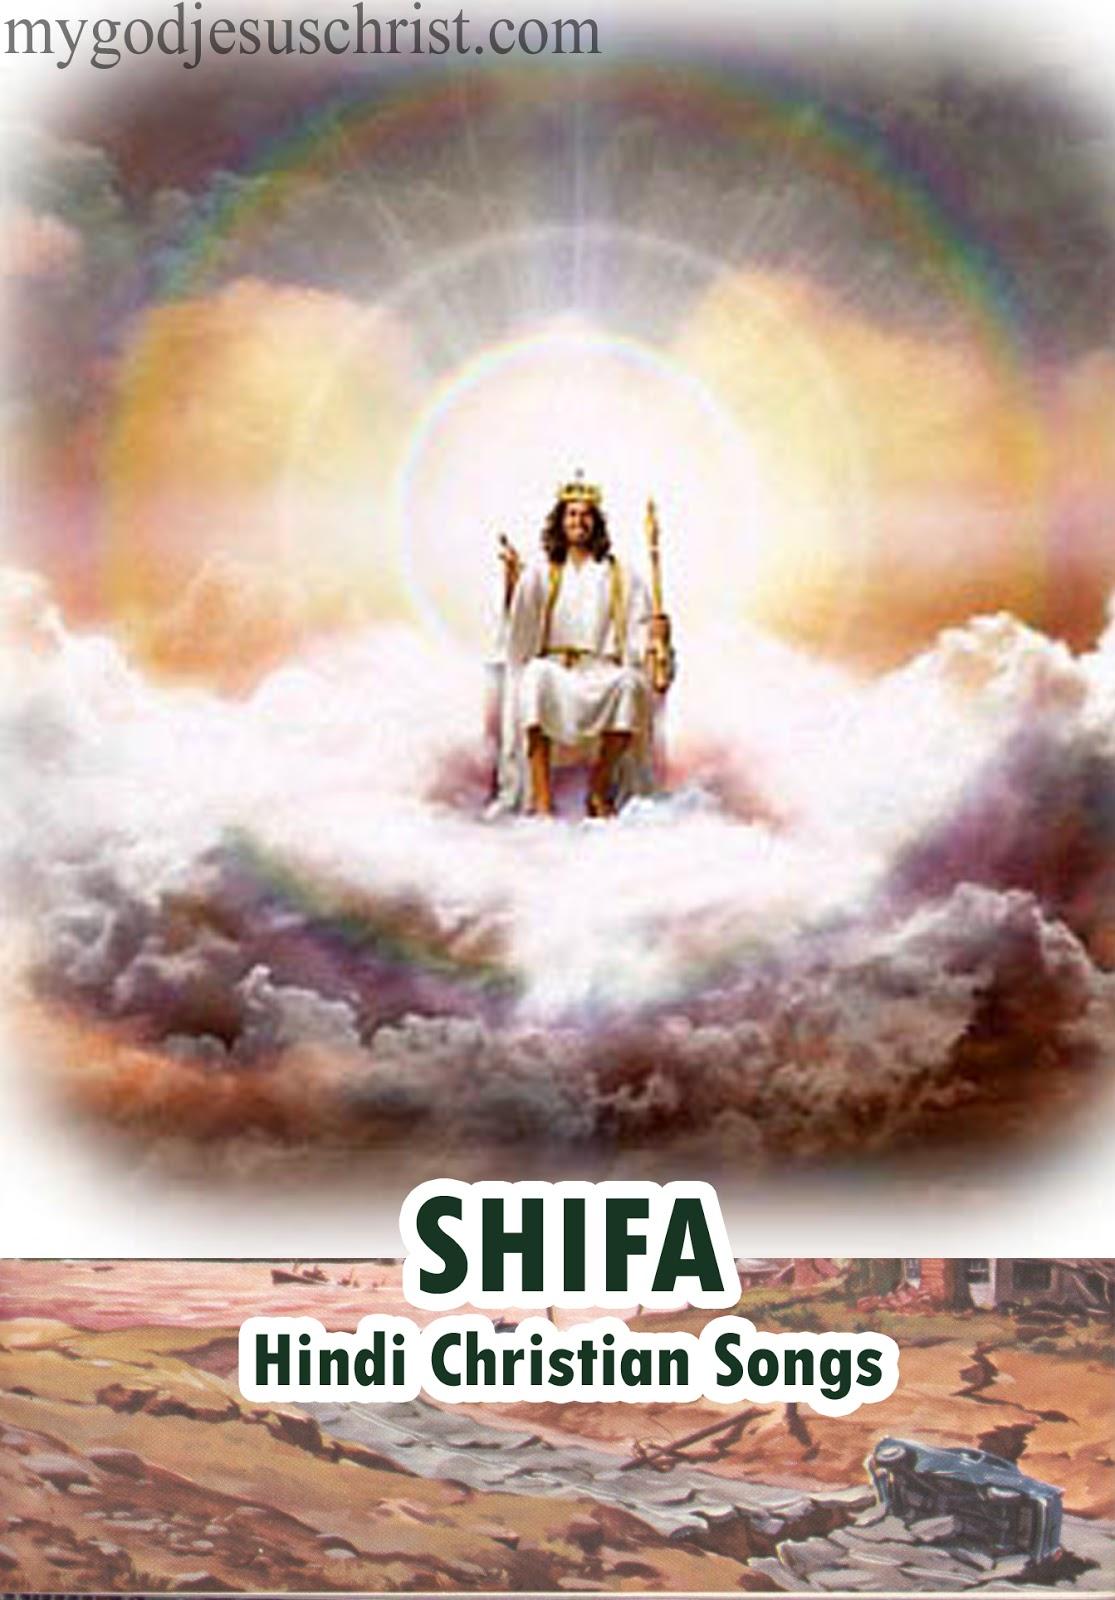 shifa hindi christian songs free download christian songs and stuff